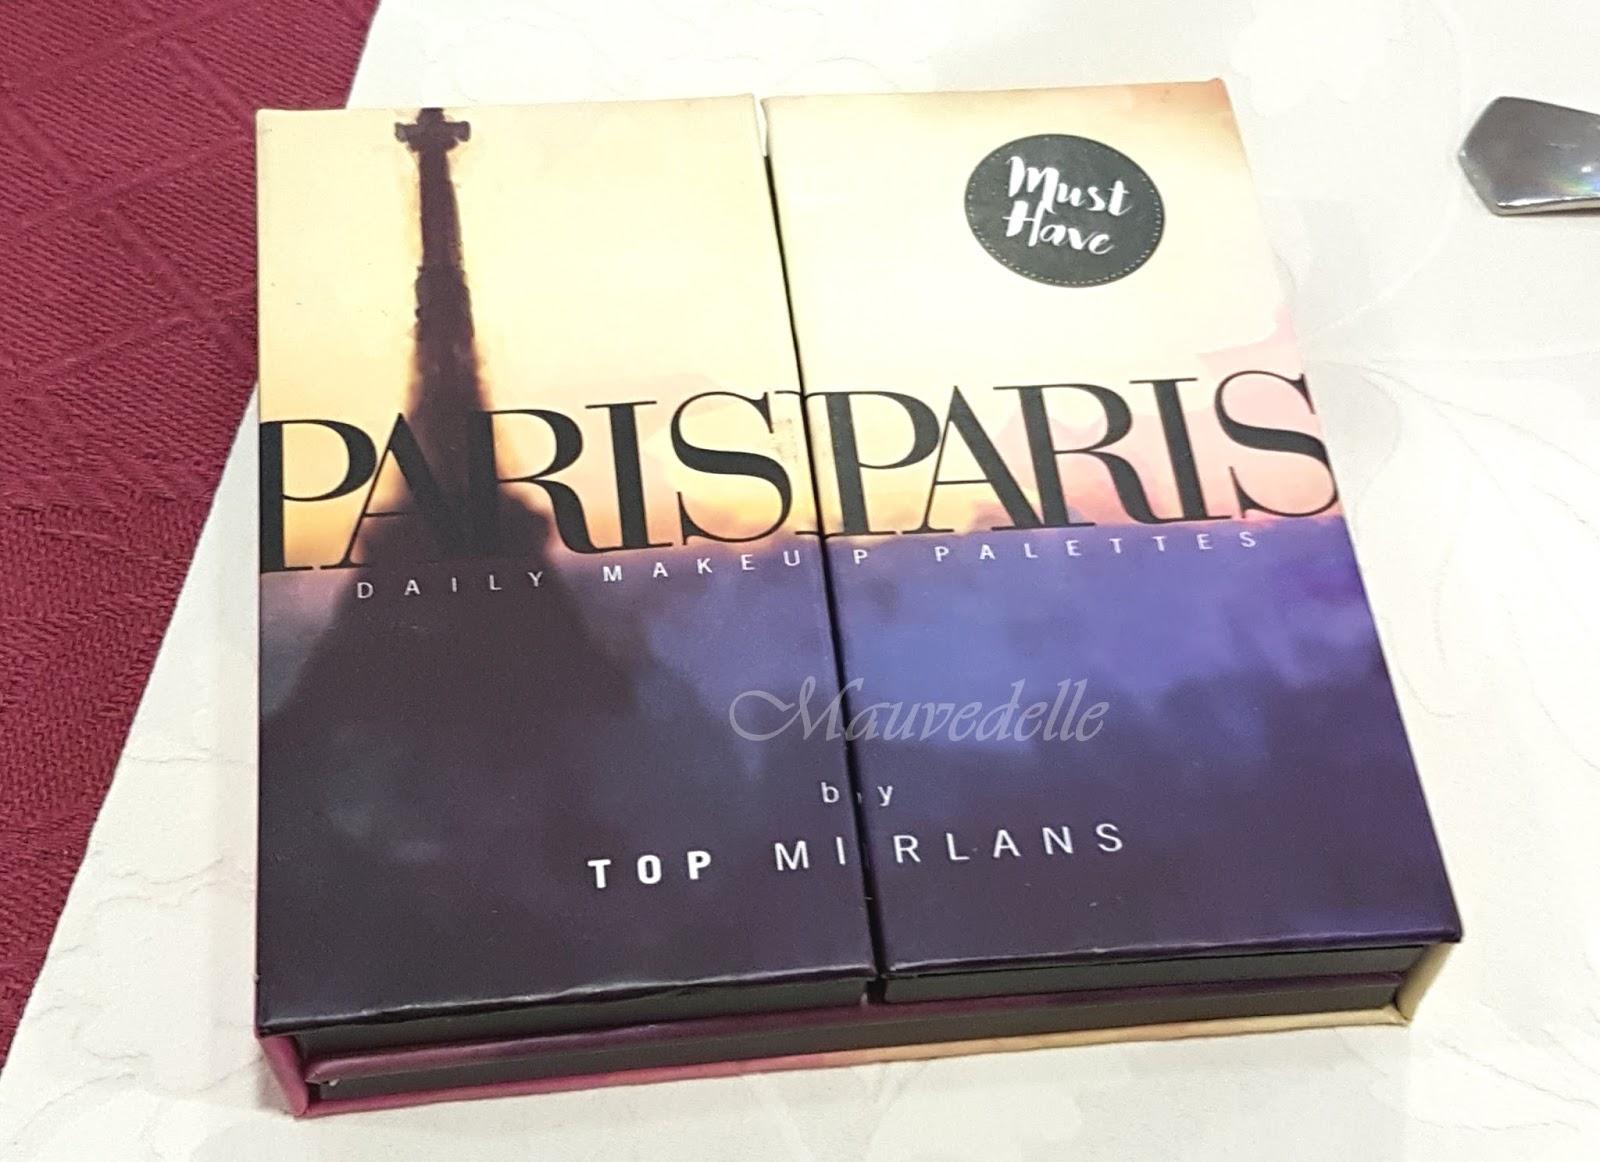 60fb5e461 Dancing Paris, paleta con 24 sombras de ojos, coloretes, bronzer e  iluminador también: